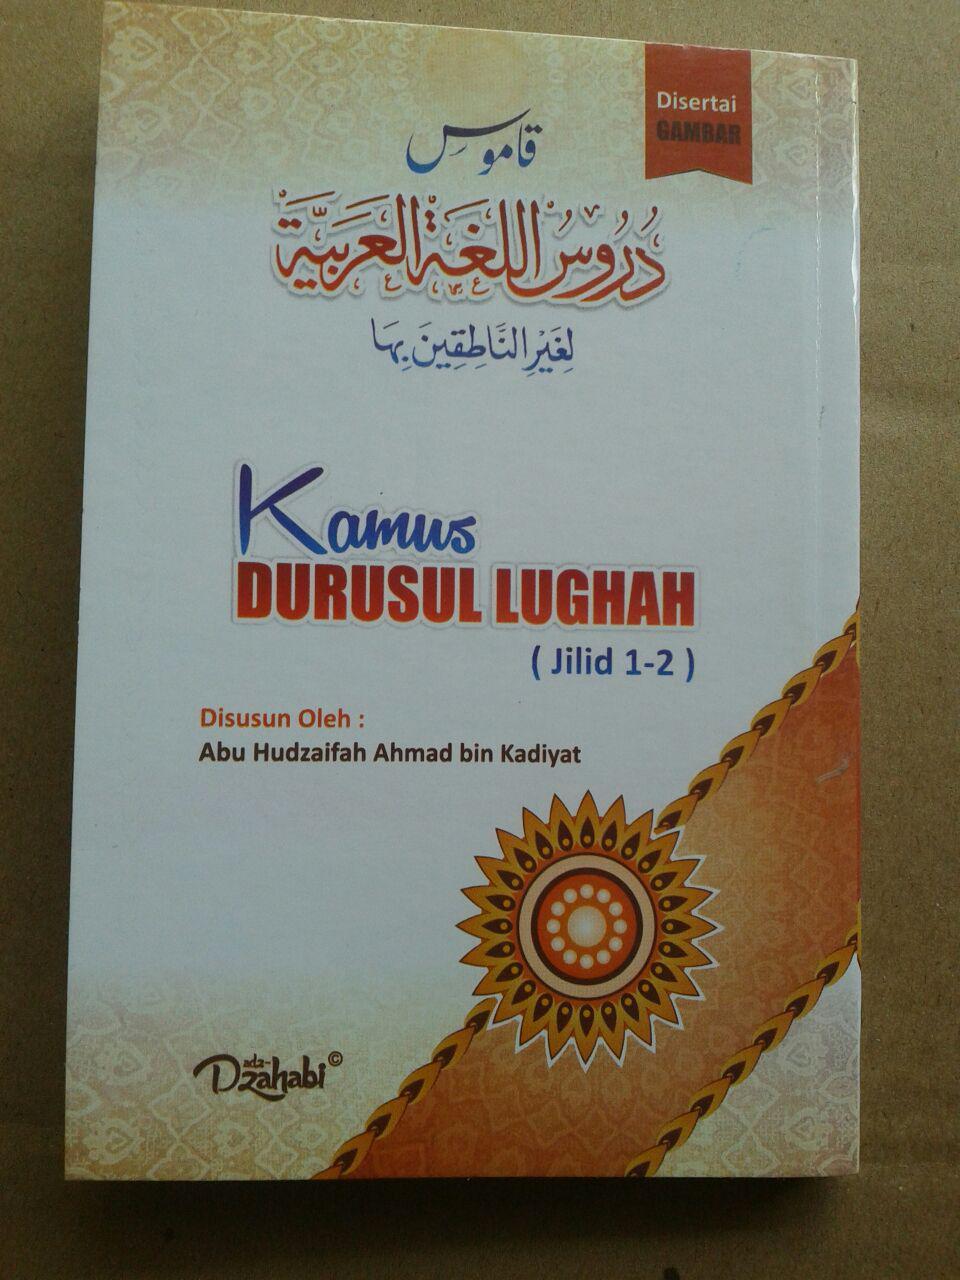 Buku Kamus Durusul Lughah cover 2